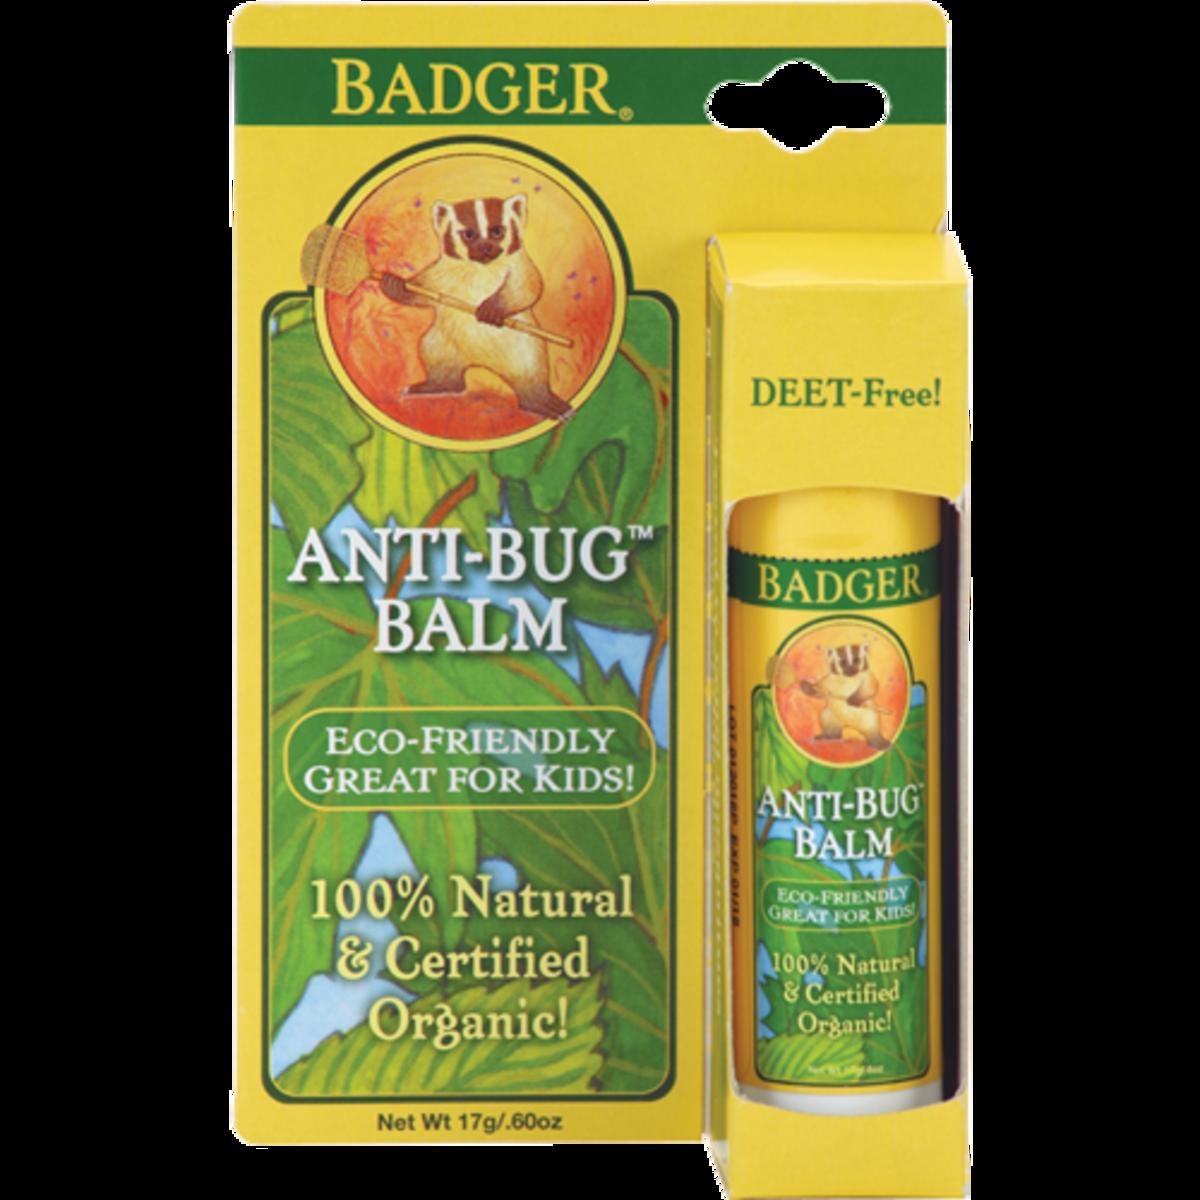 Badger Balm Anti-Bug Balm Stick